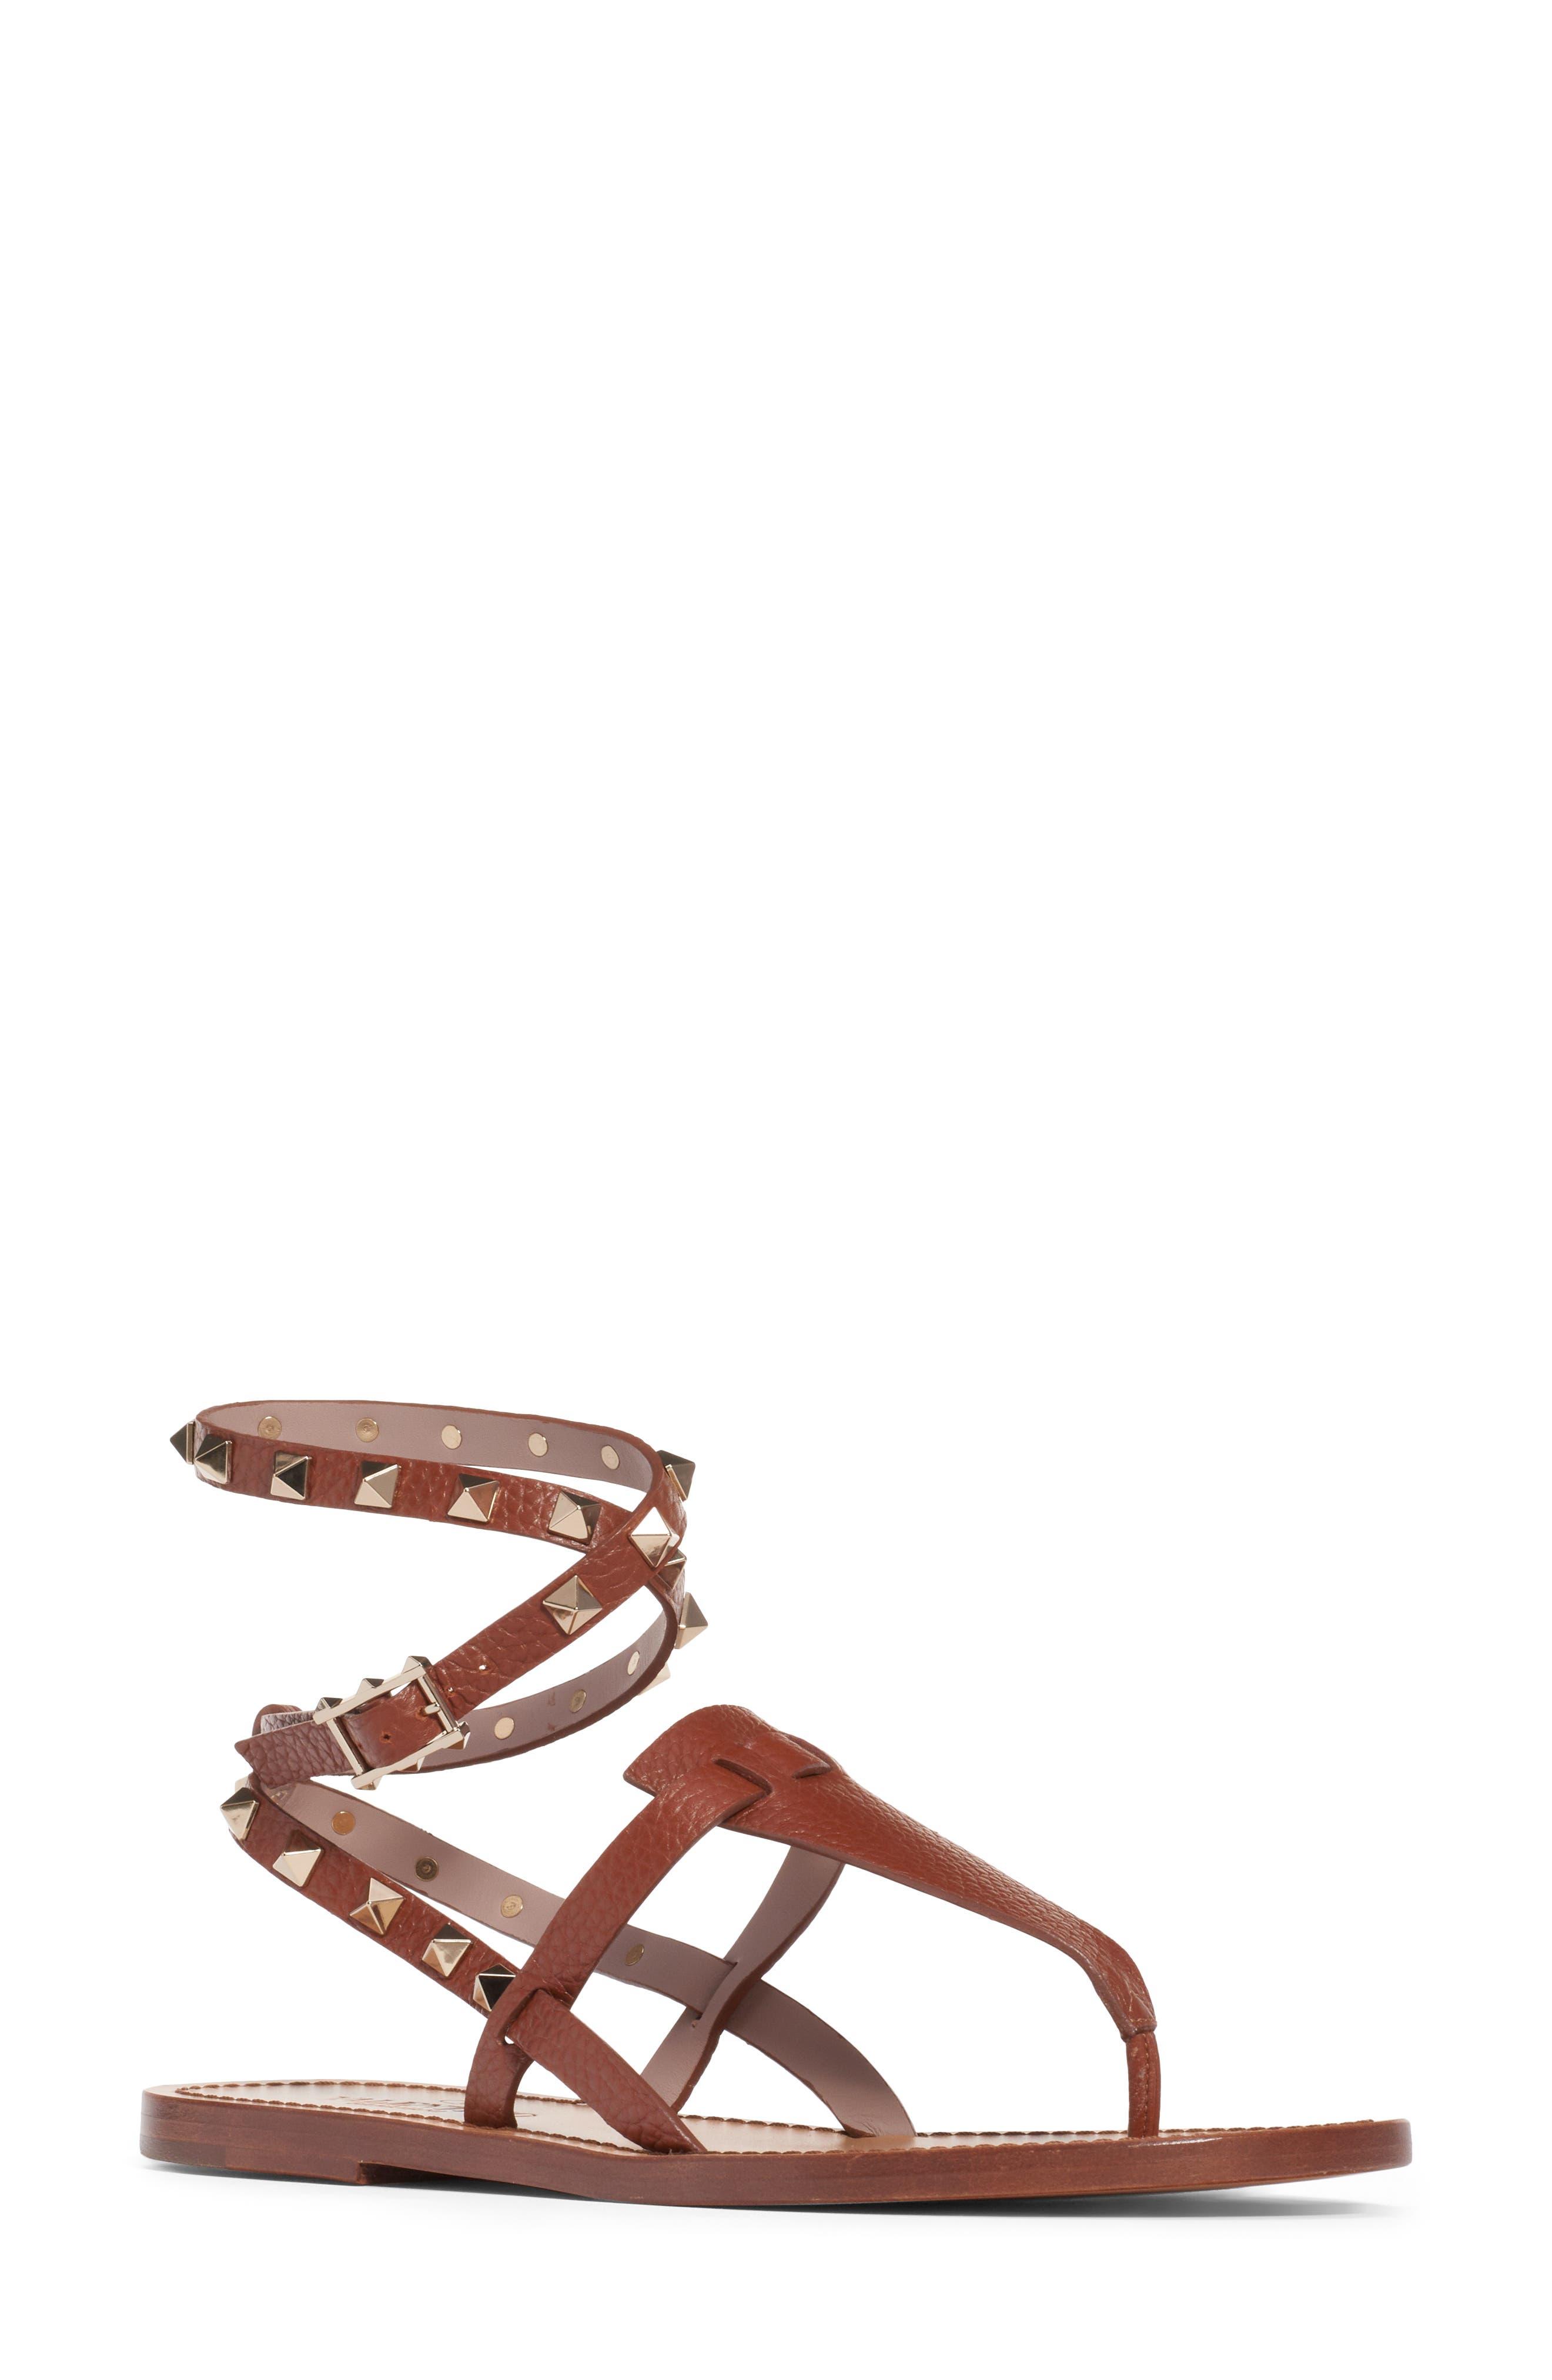 VALENTINO GARAVANI Rockstud Ankle Wrap Sandal, Main, color, COGNAC